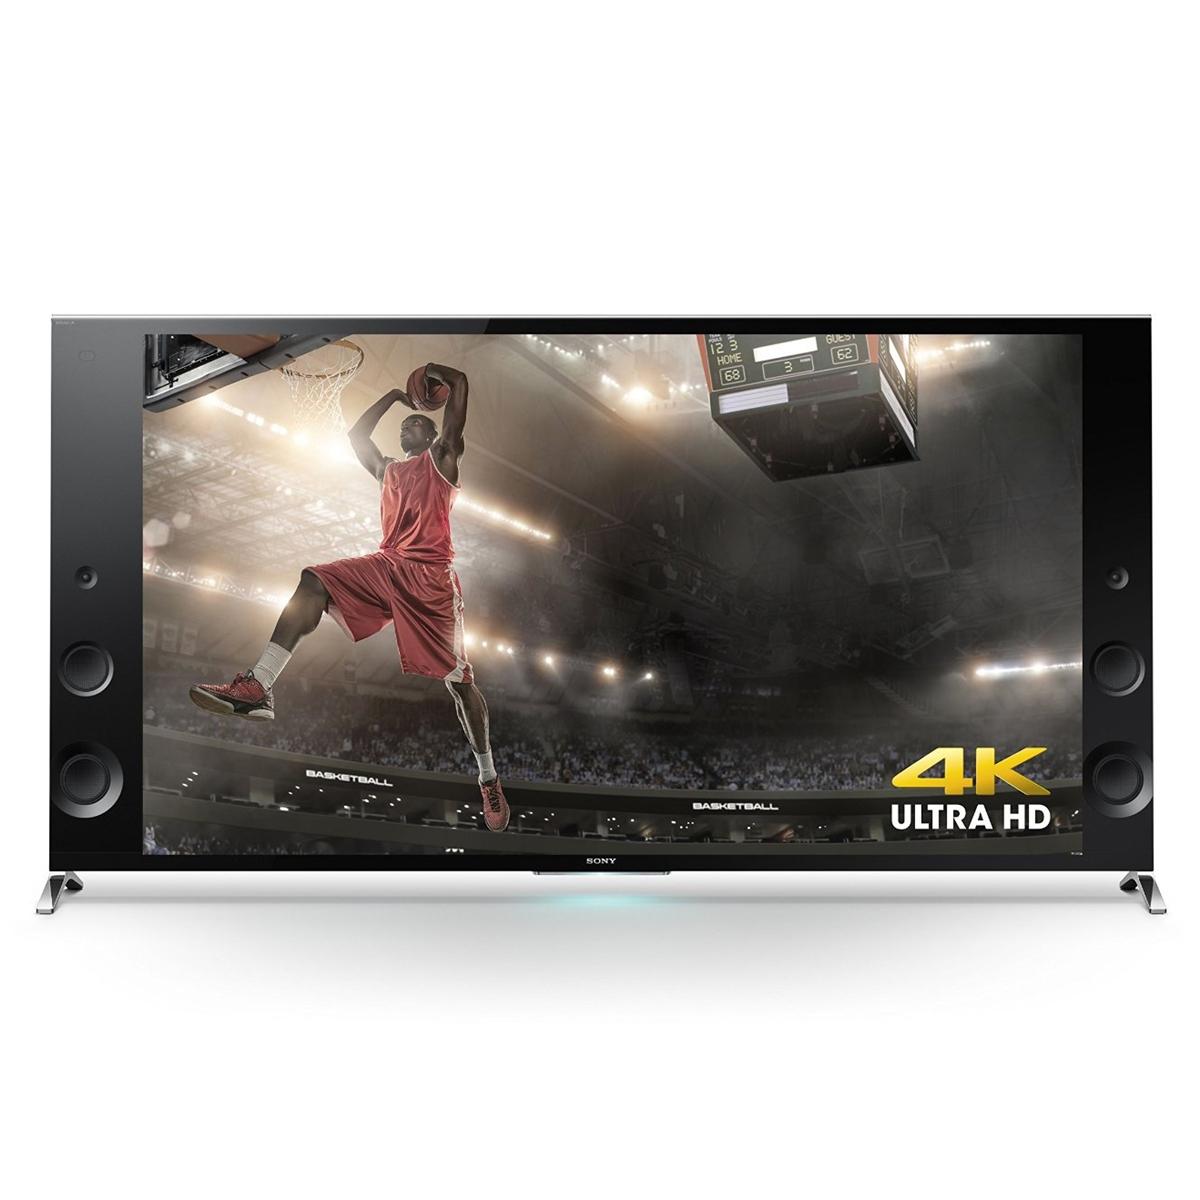 Sony 65inch XBR Series LED 4K Ultra HDTV - XBR-65X900B